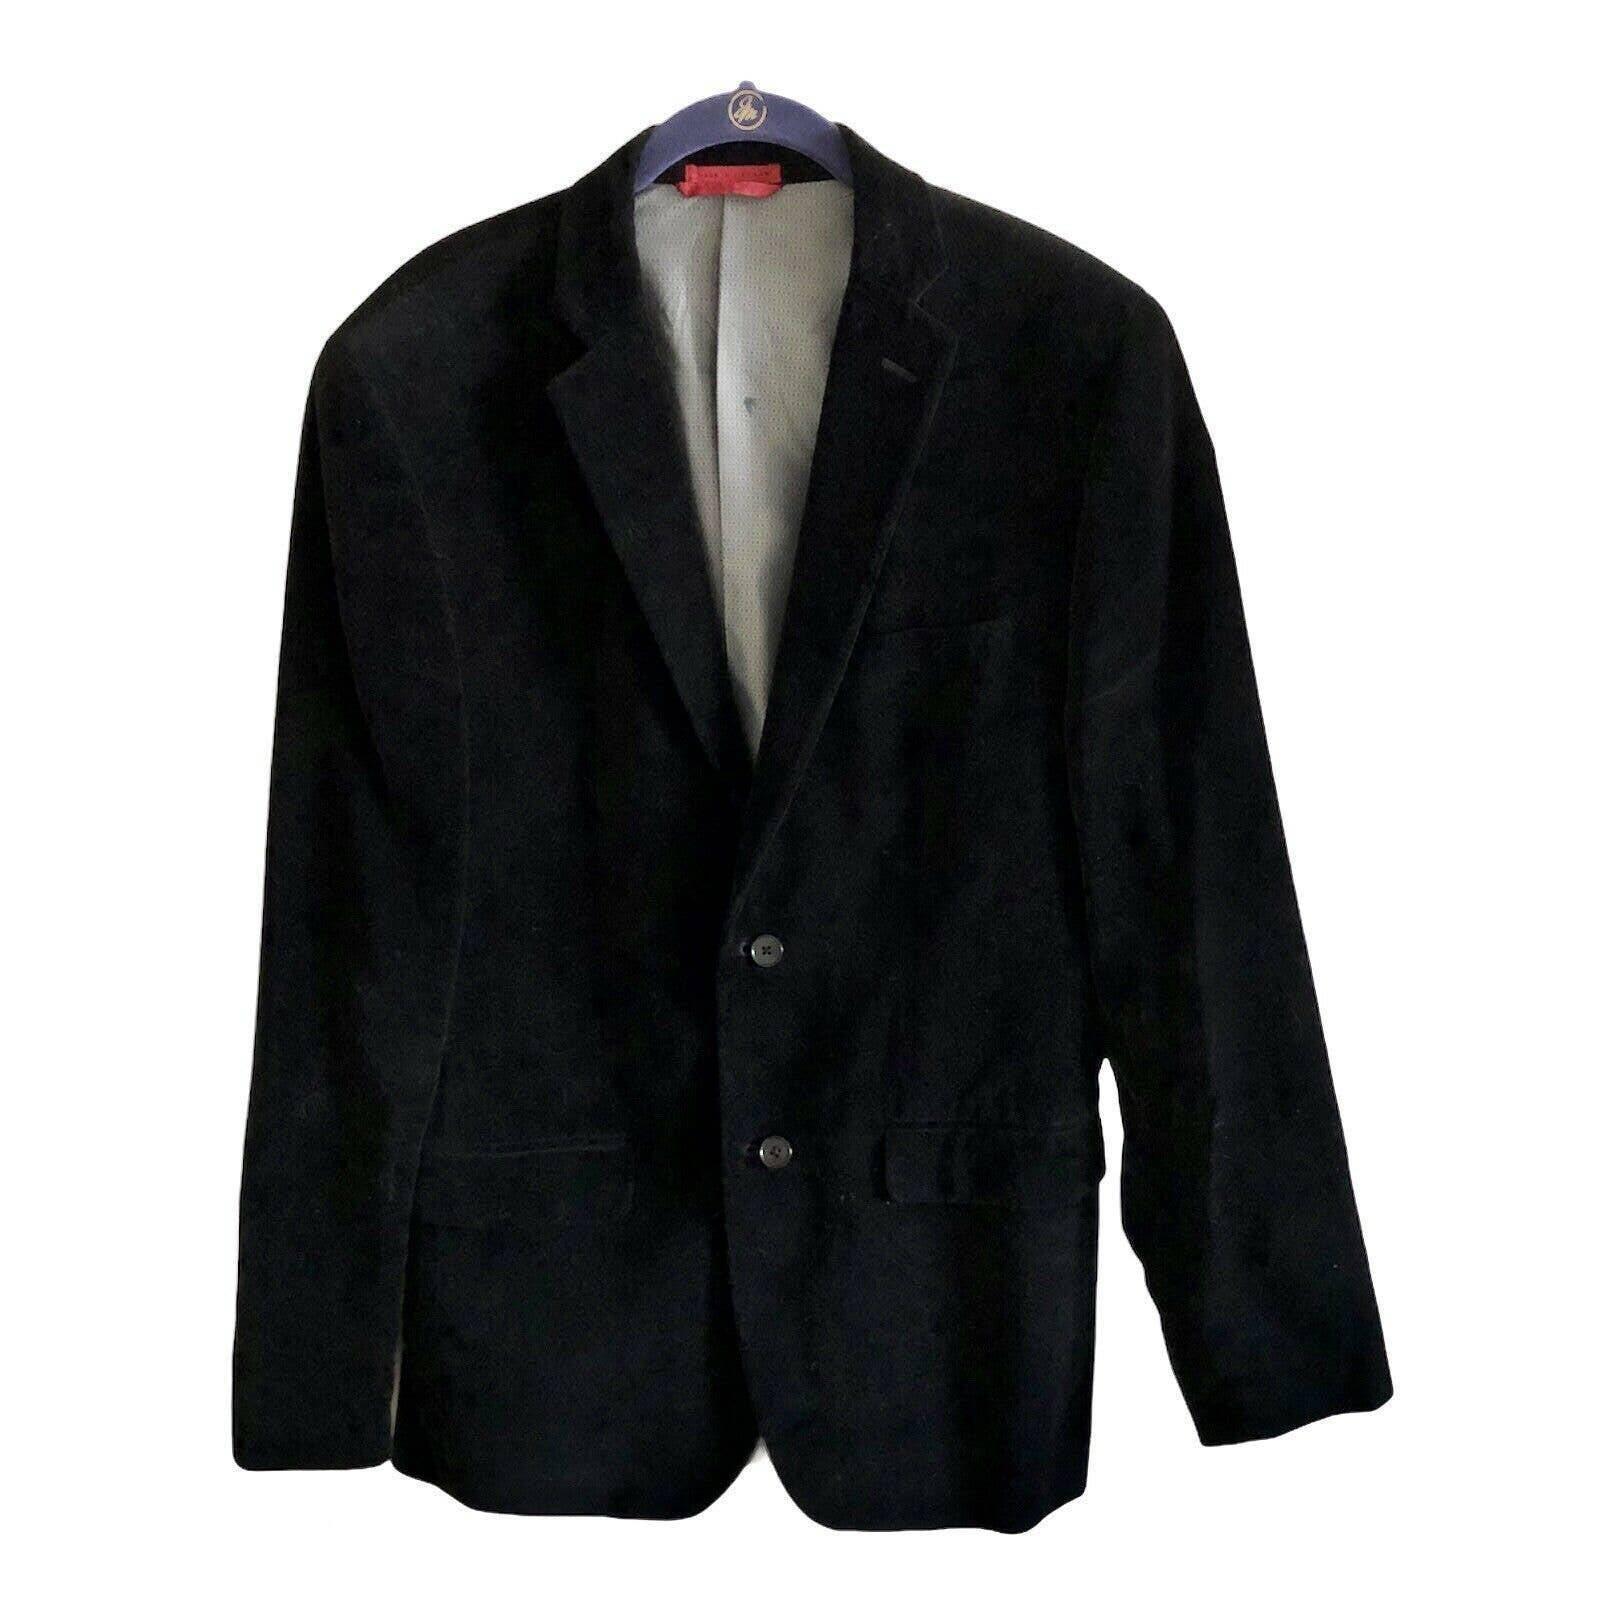 Alfani Black Velvet Blazer/Jacket 38